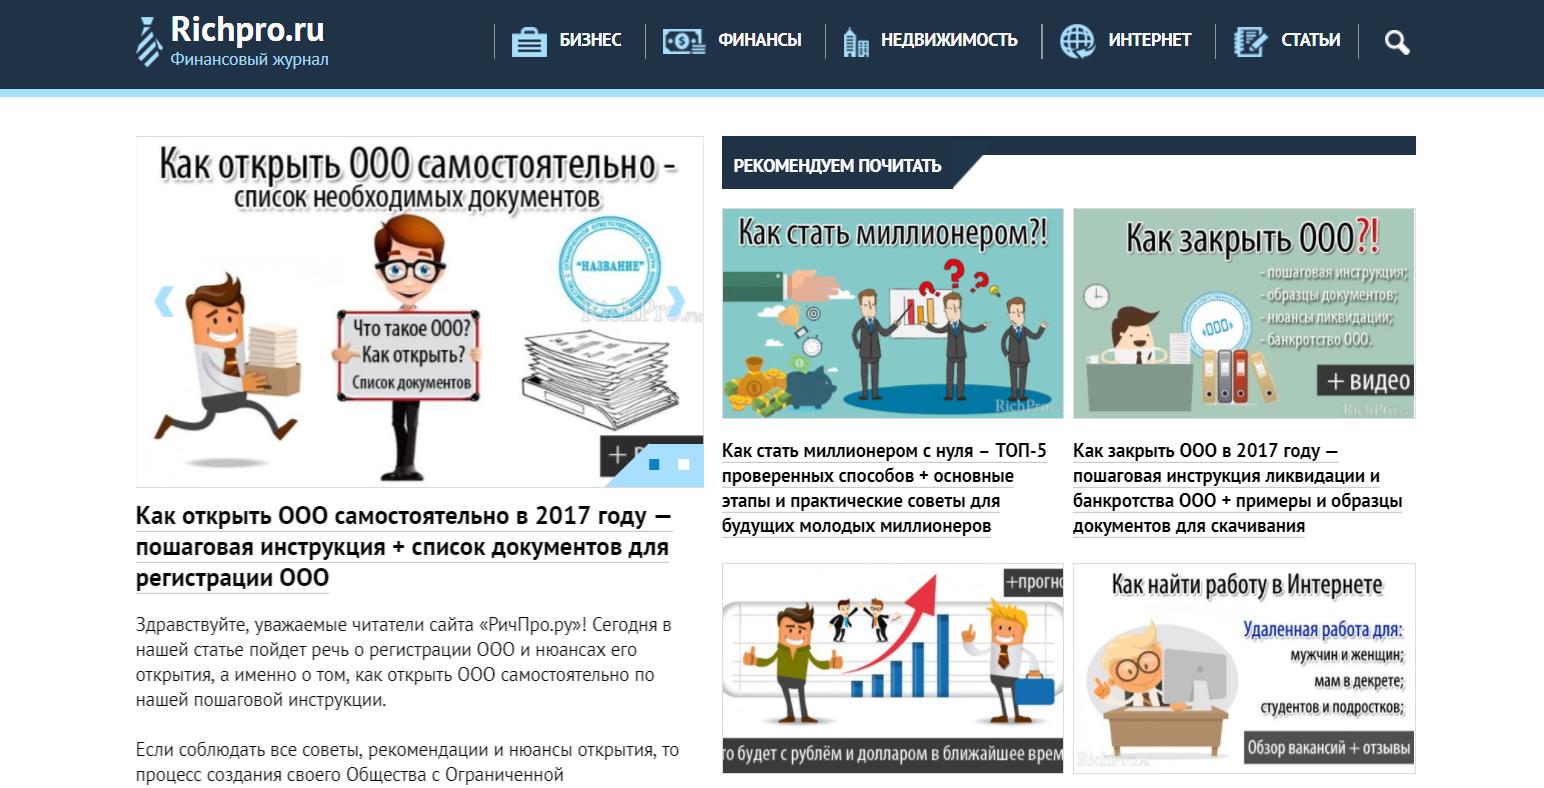 Richpro.ru